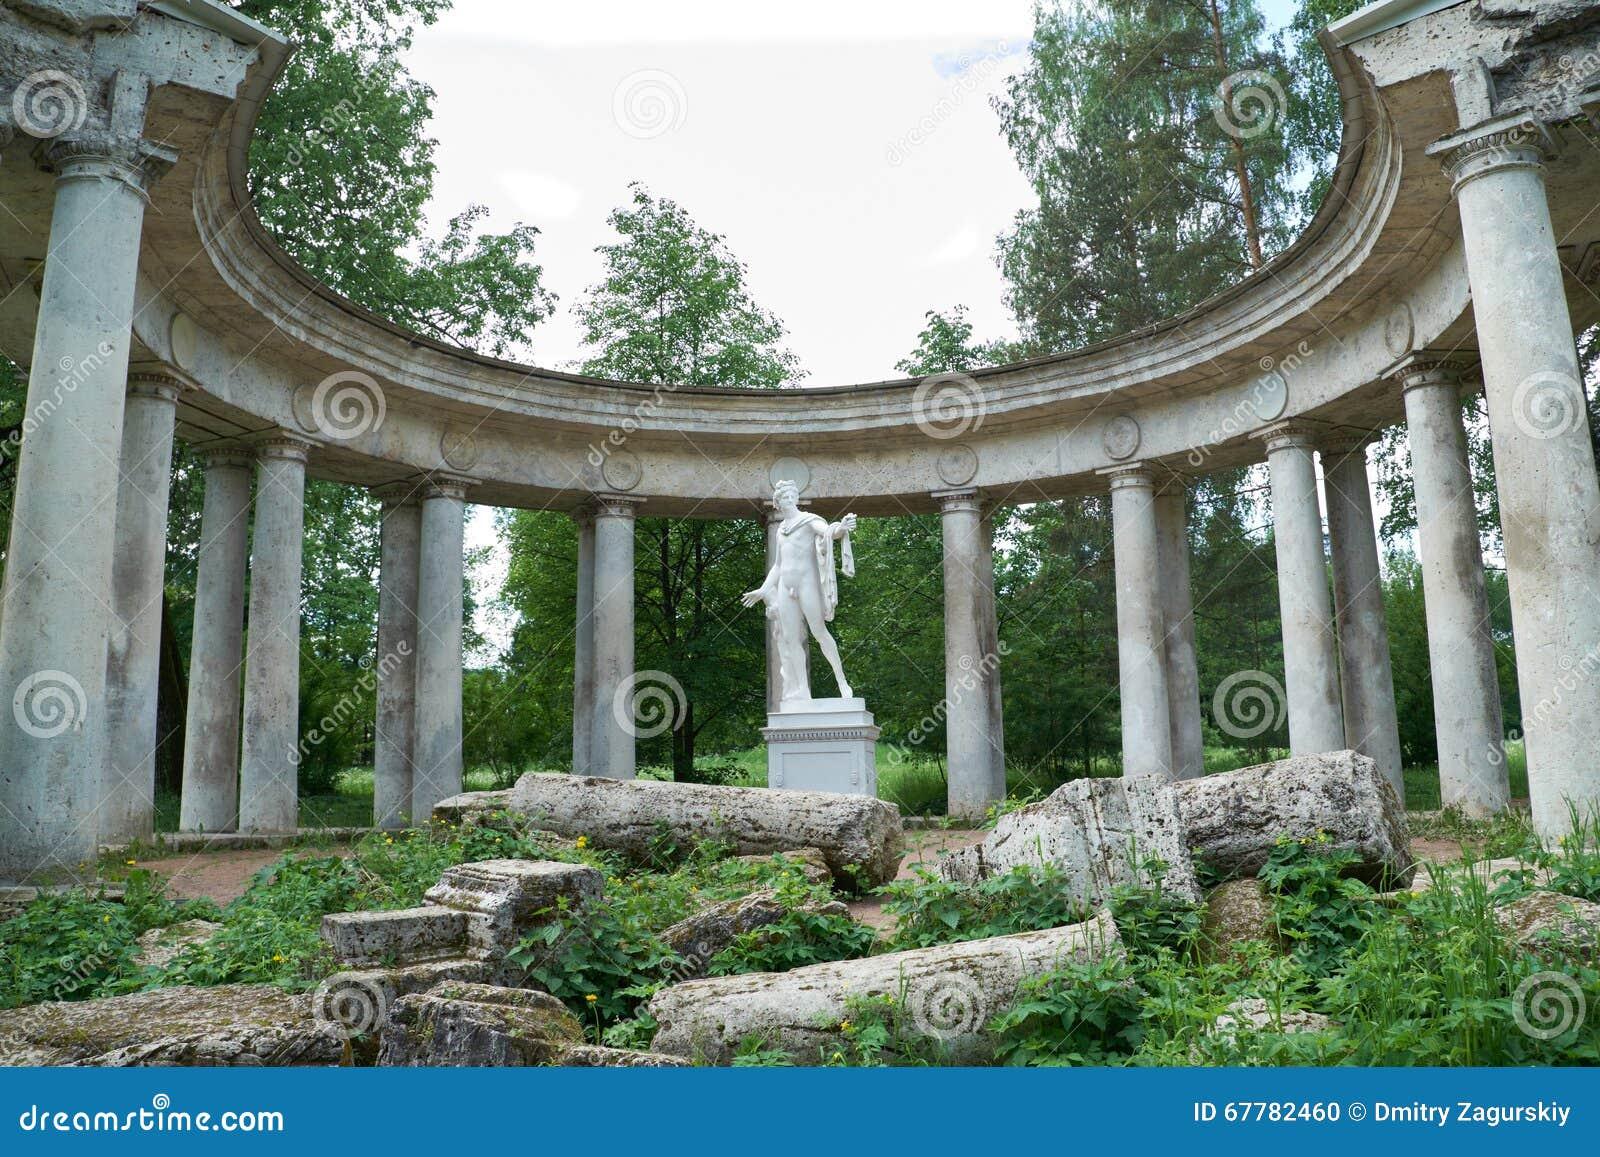 Apollo-colonnade in Pavlovsk, St. Petersburg